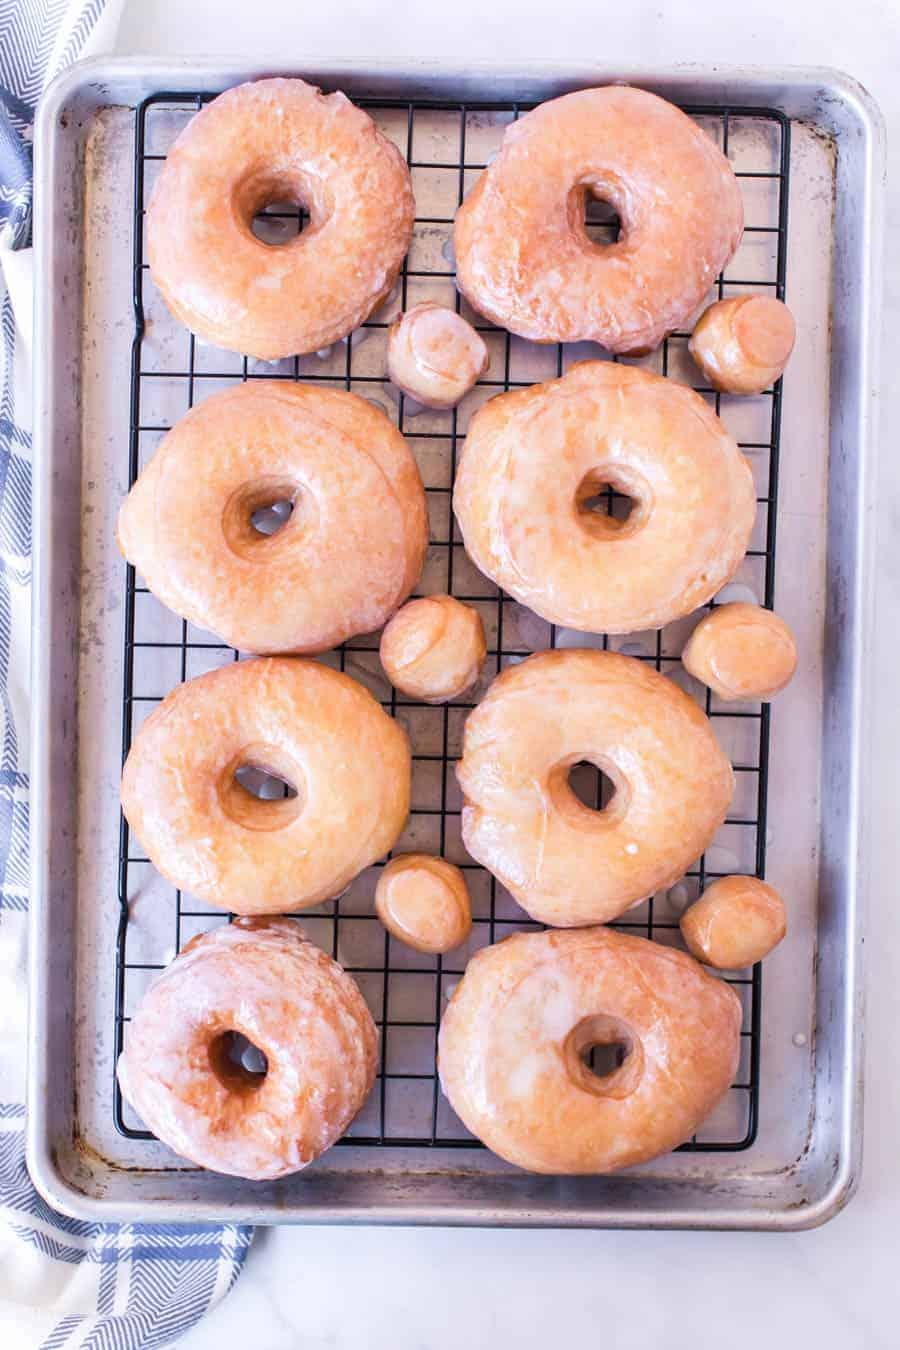 Rack of glazed donuts